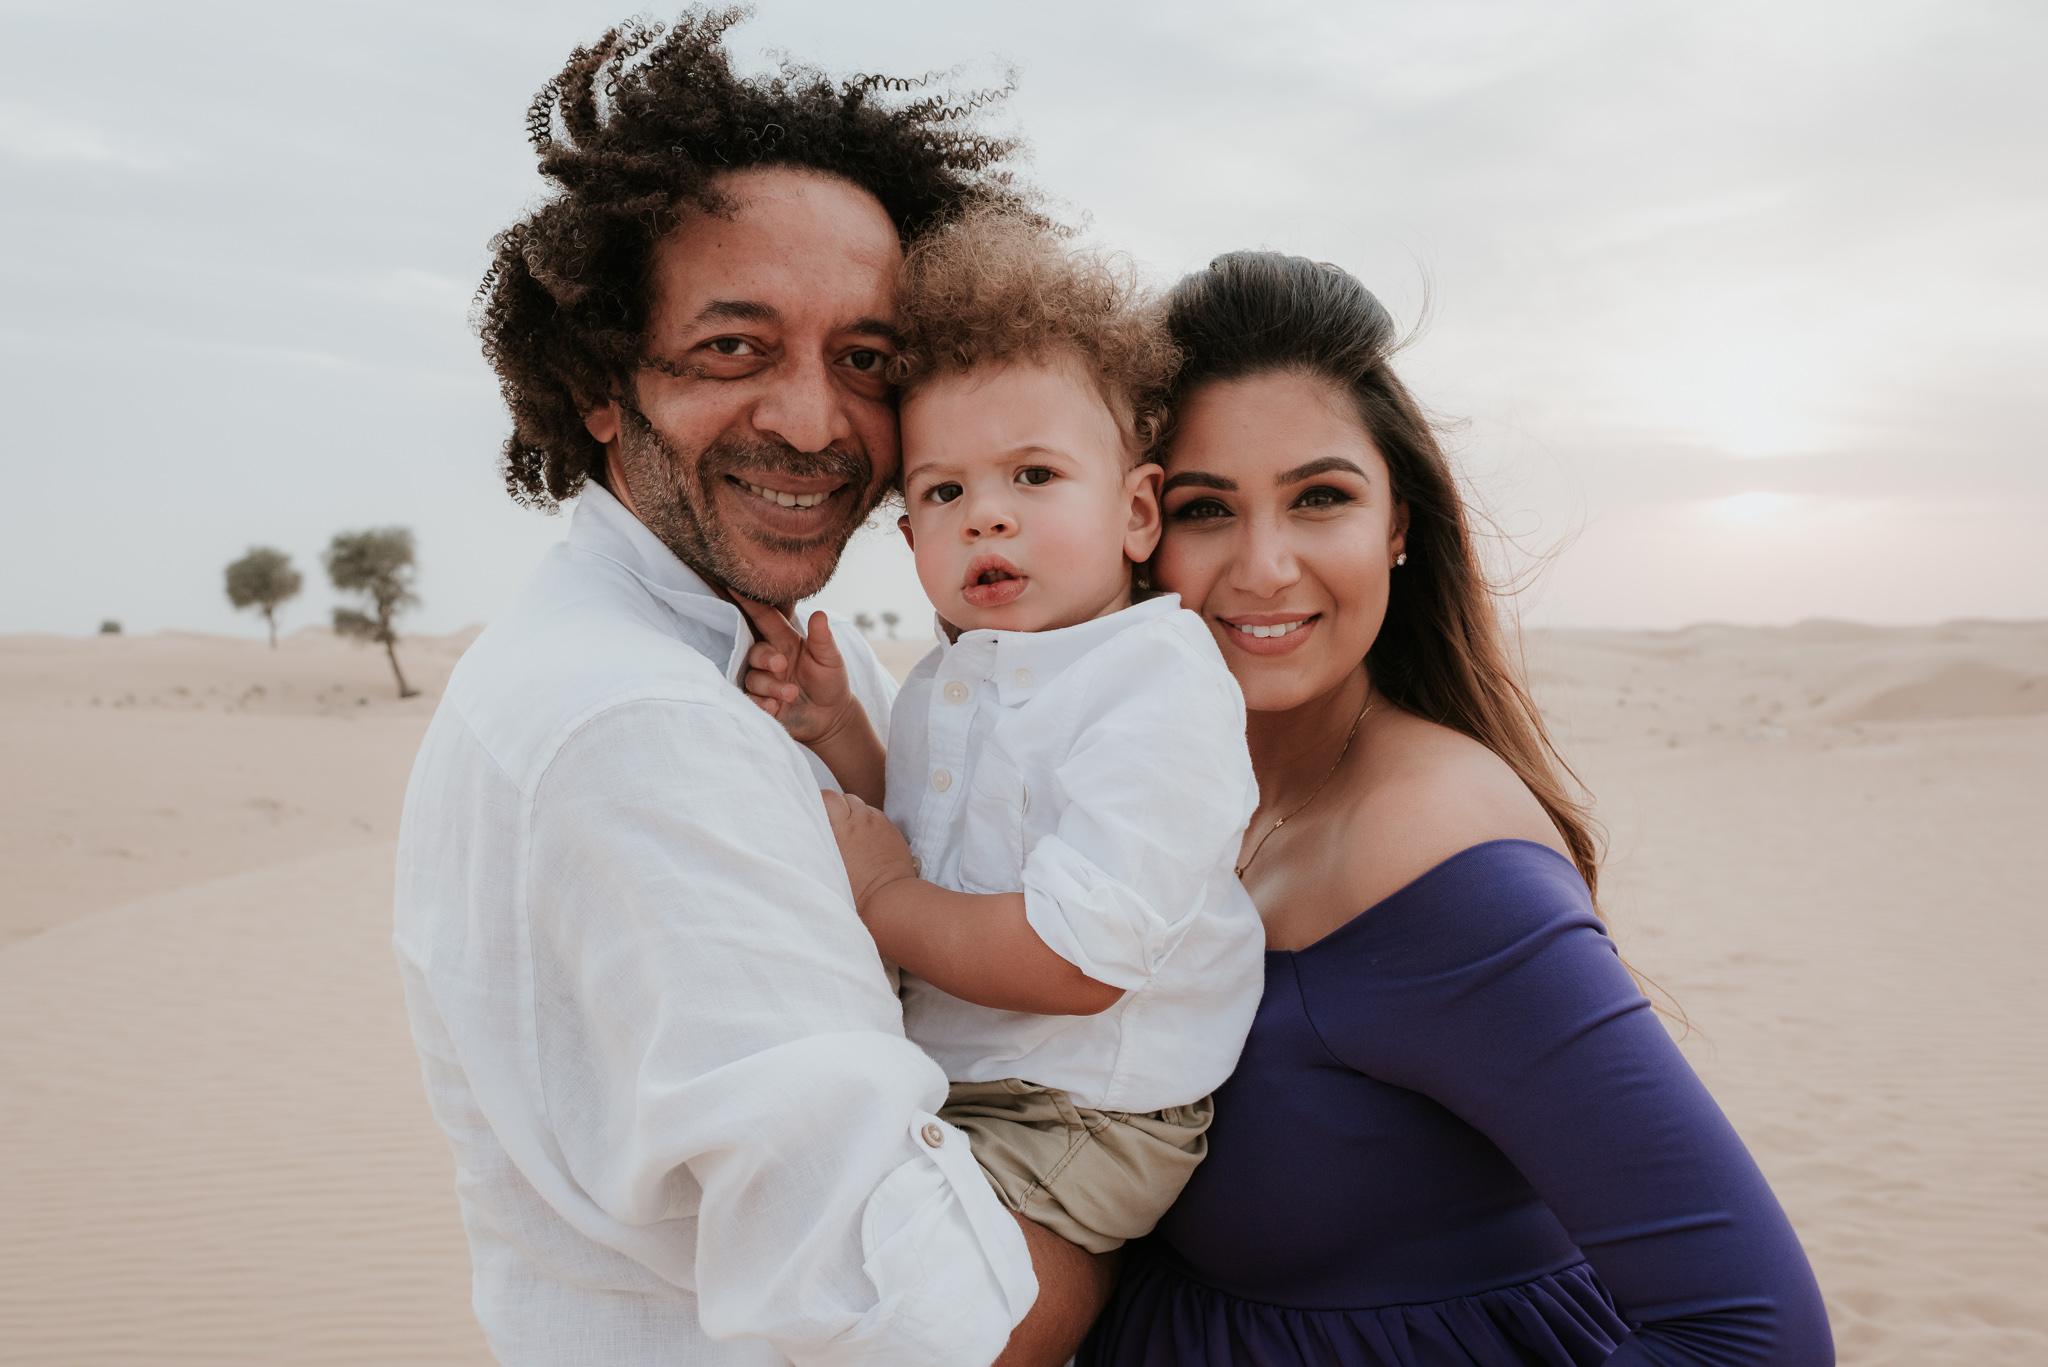 Lana-Photographs-Dubai-Maternity-Photographer-FatimaE-PSLR-45.jpg